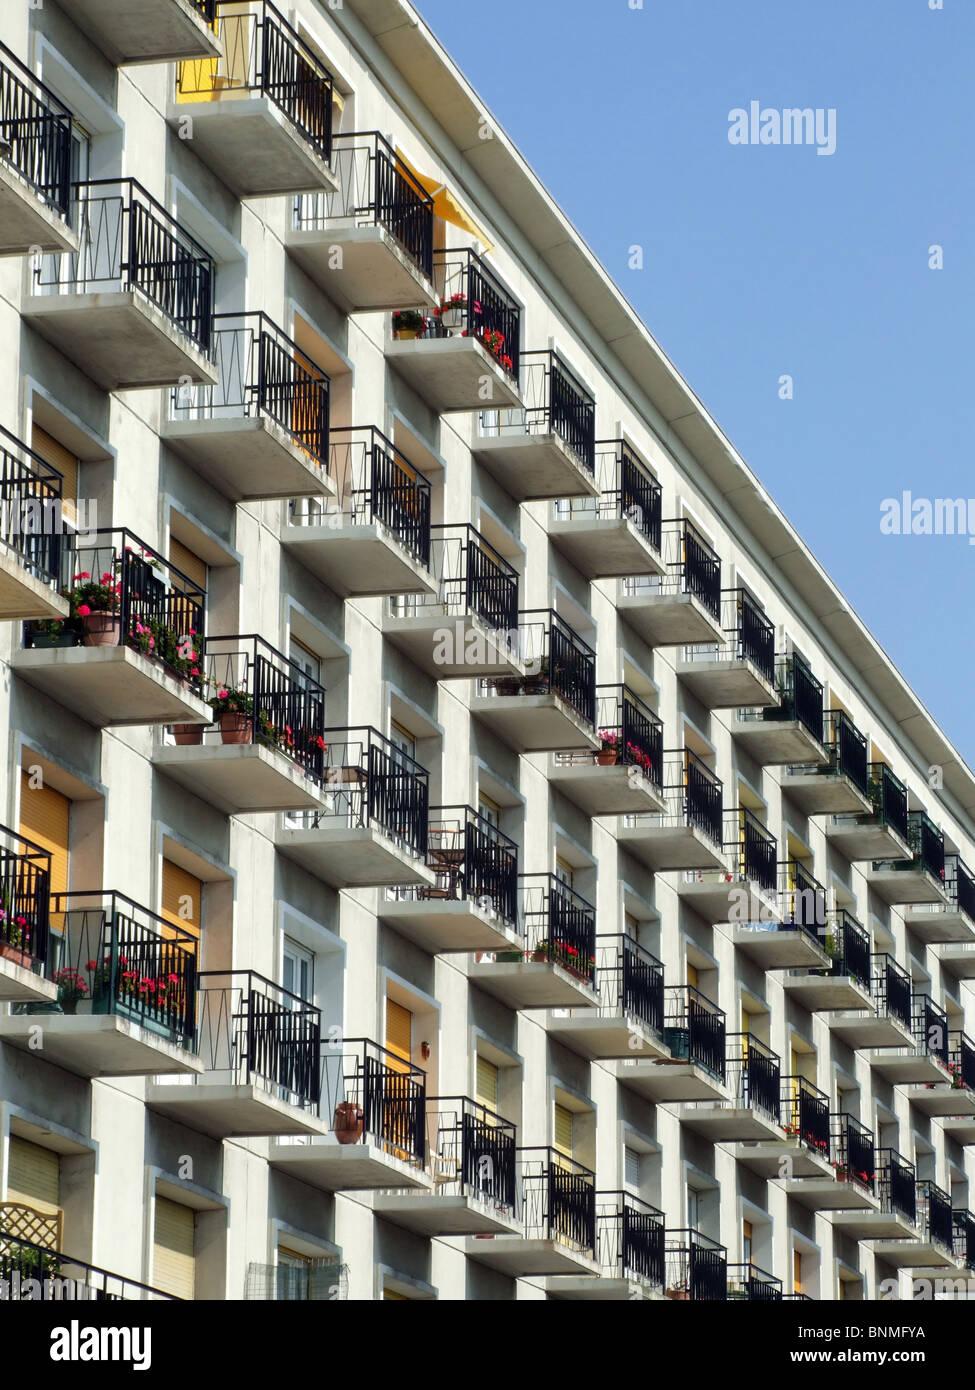 Architecture Apartments Balconies Apartment House Hlm Le Havre Stock Photo Alamy